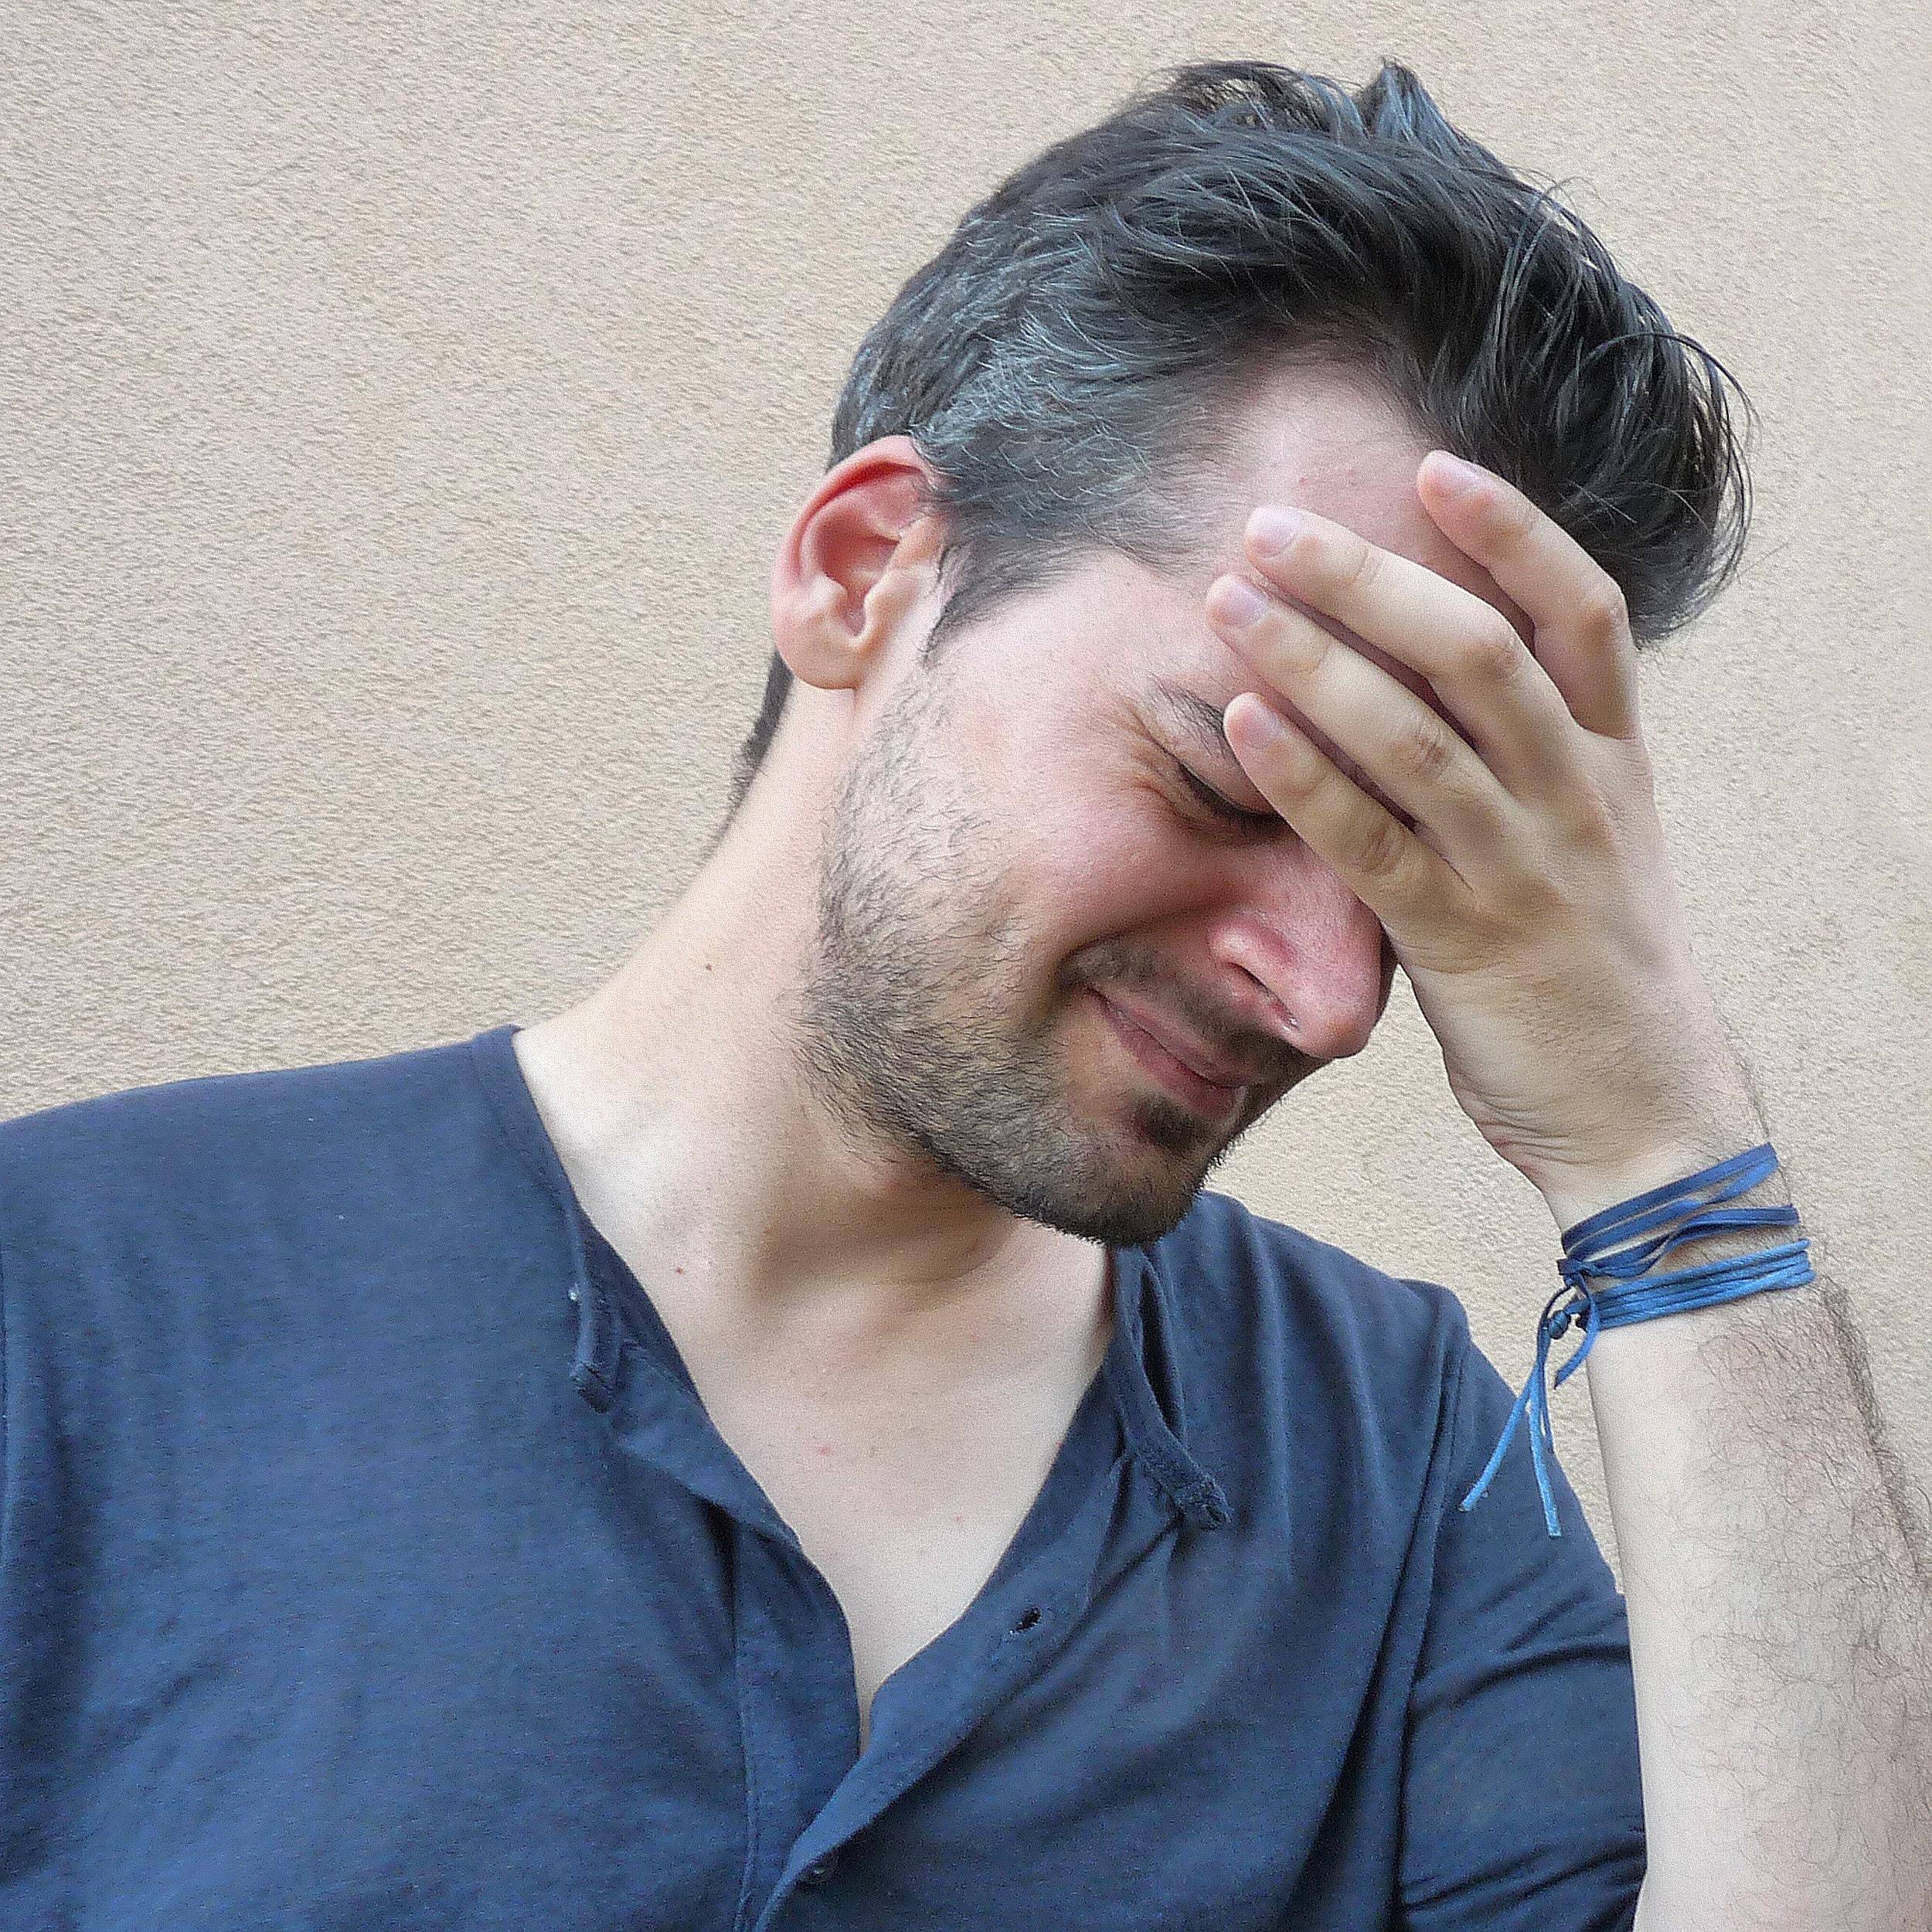 Free Stock Photo Of Headache Image Man